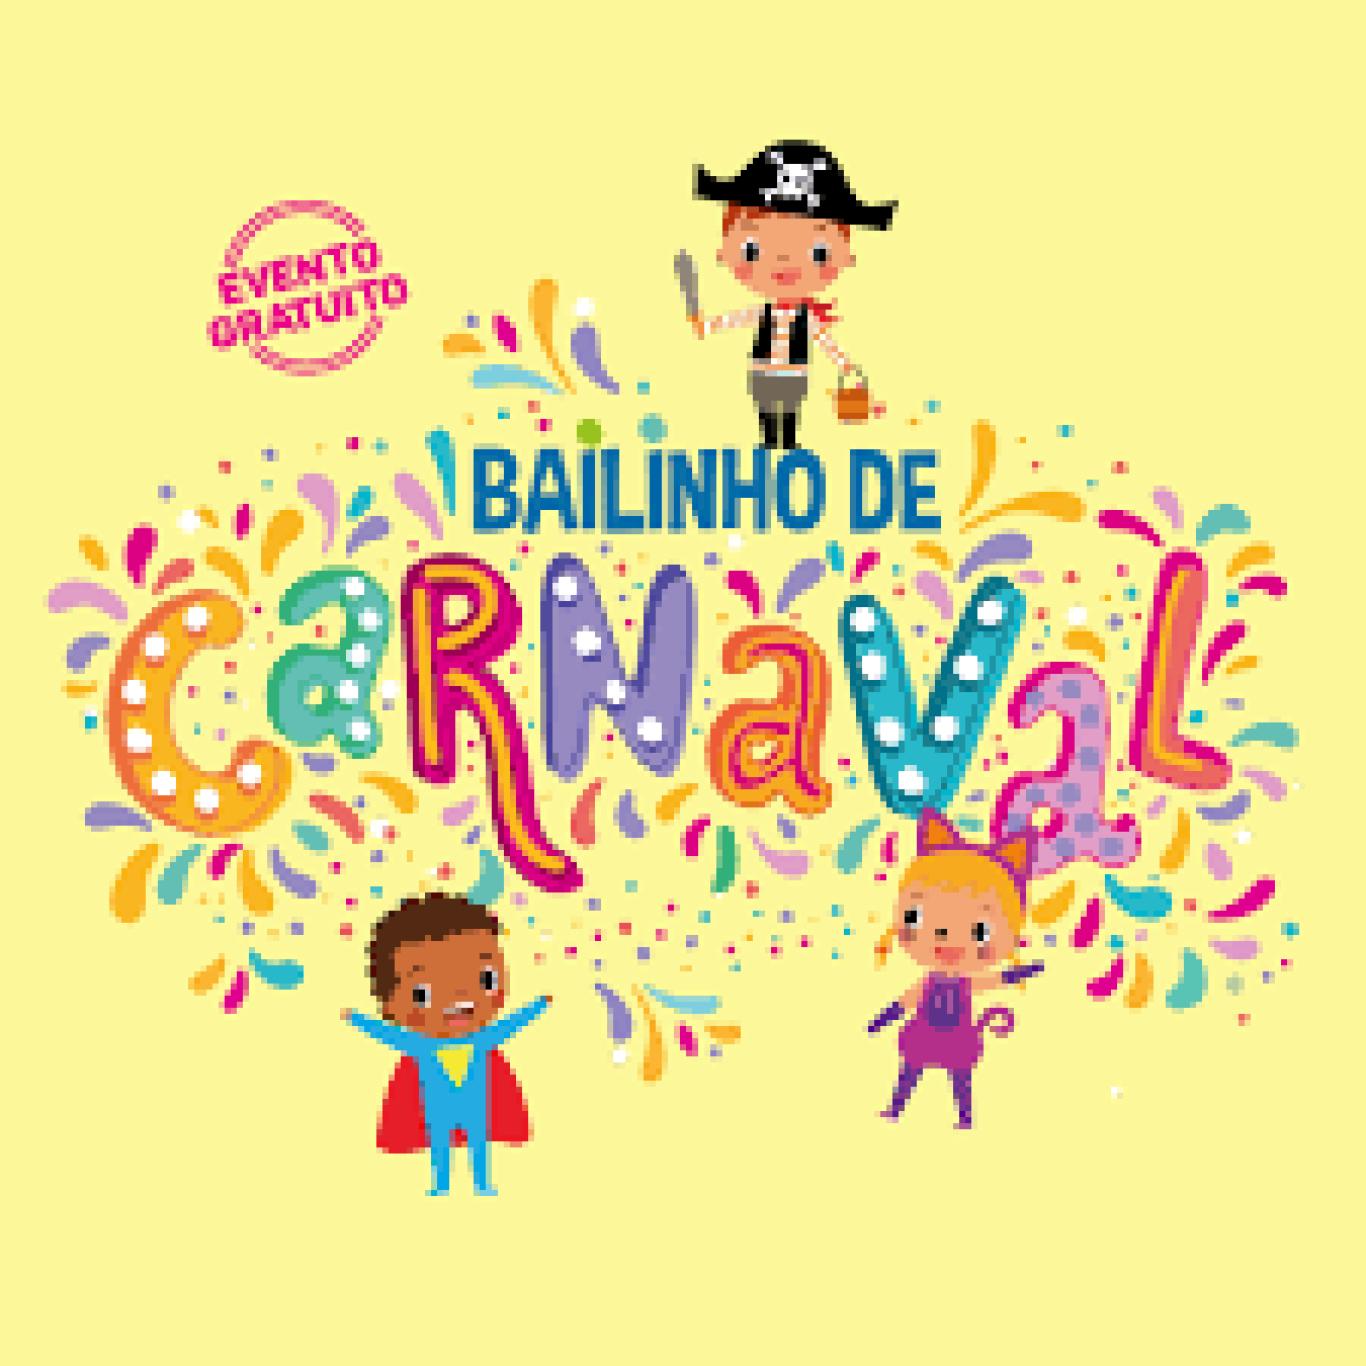 Baile de Carnaval Infantil com Pool Party e Concurso de Fantasia